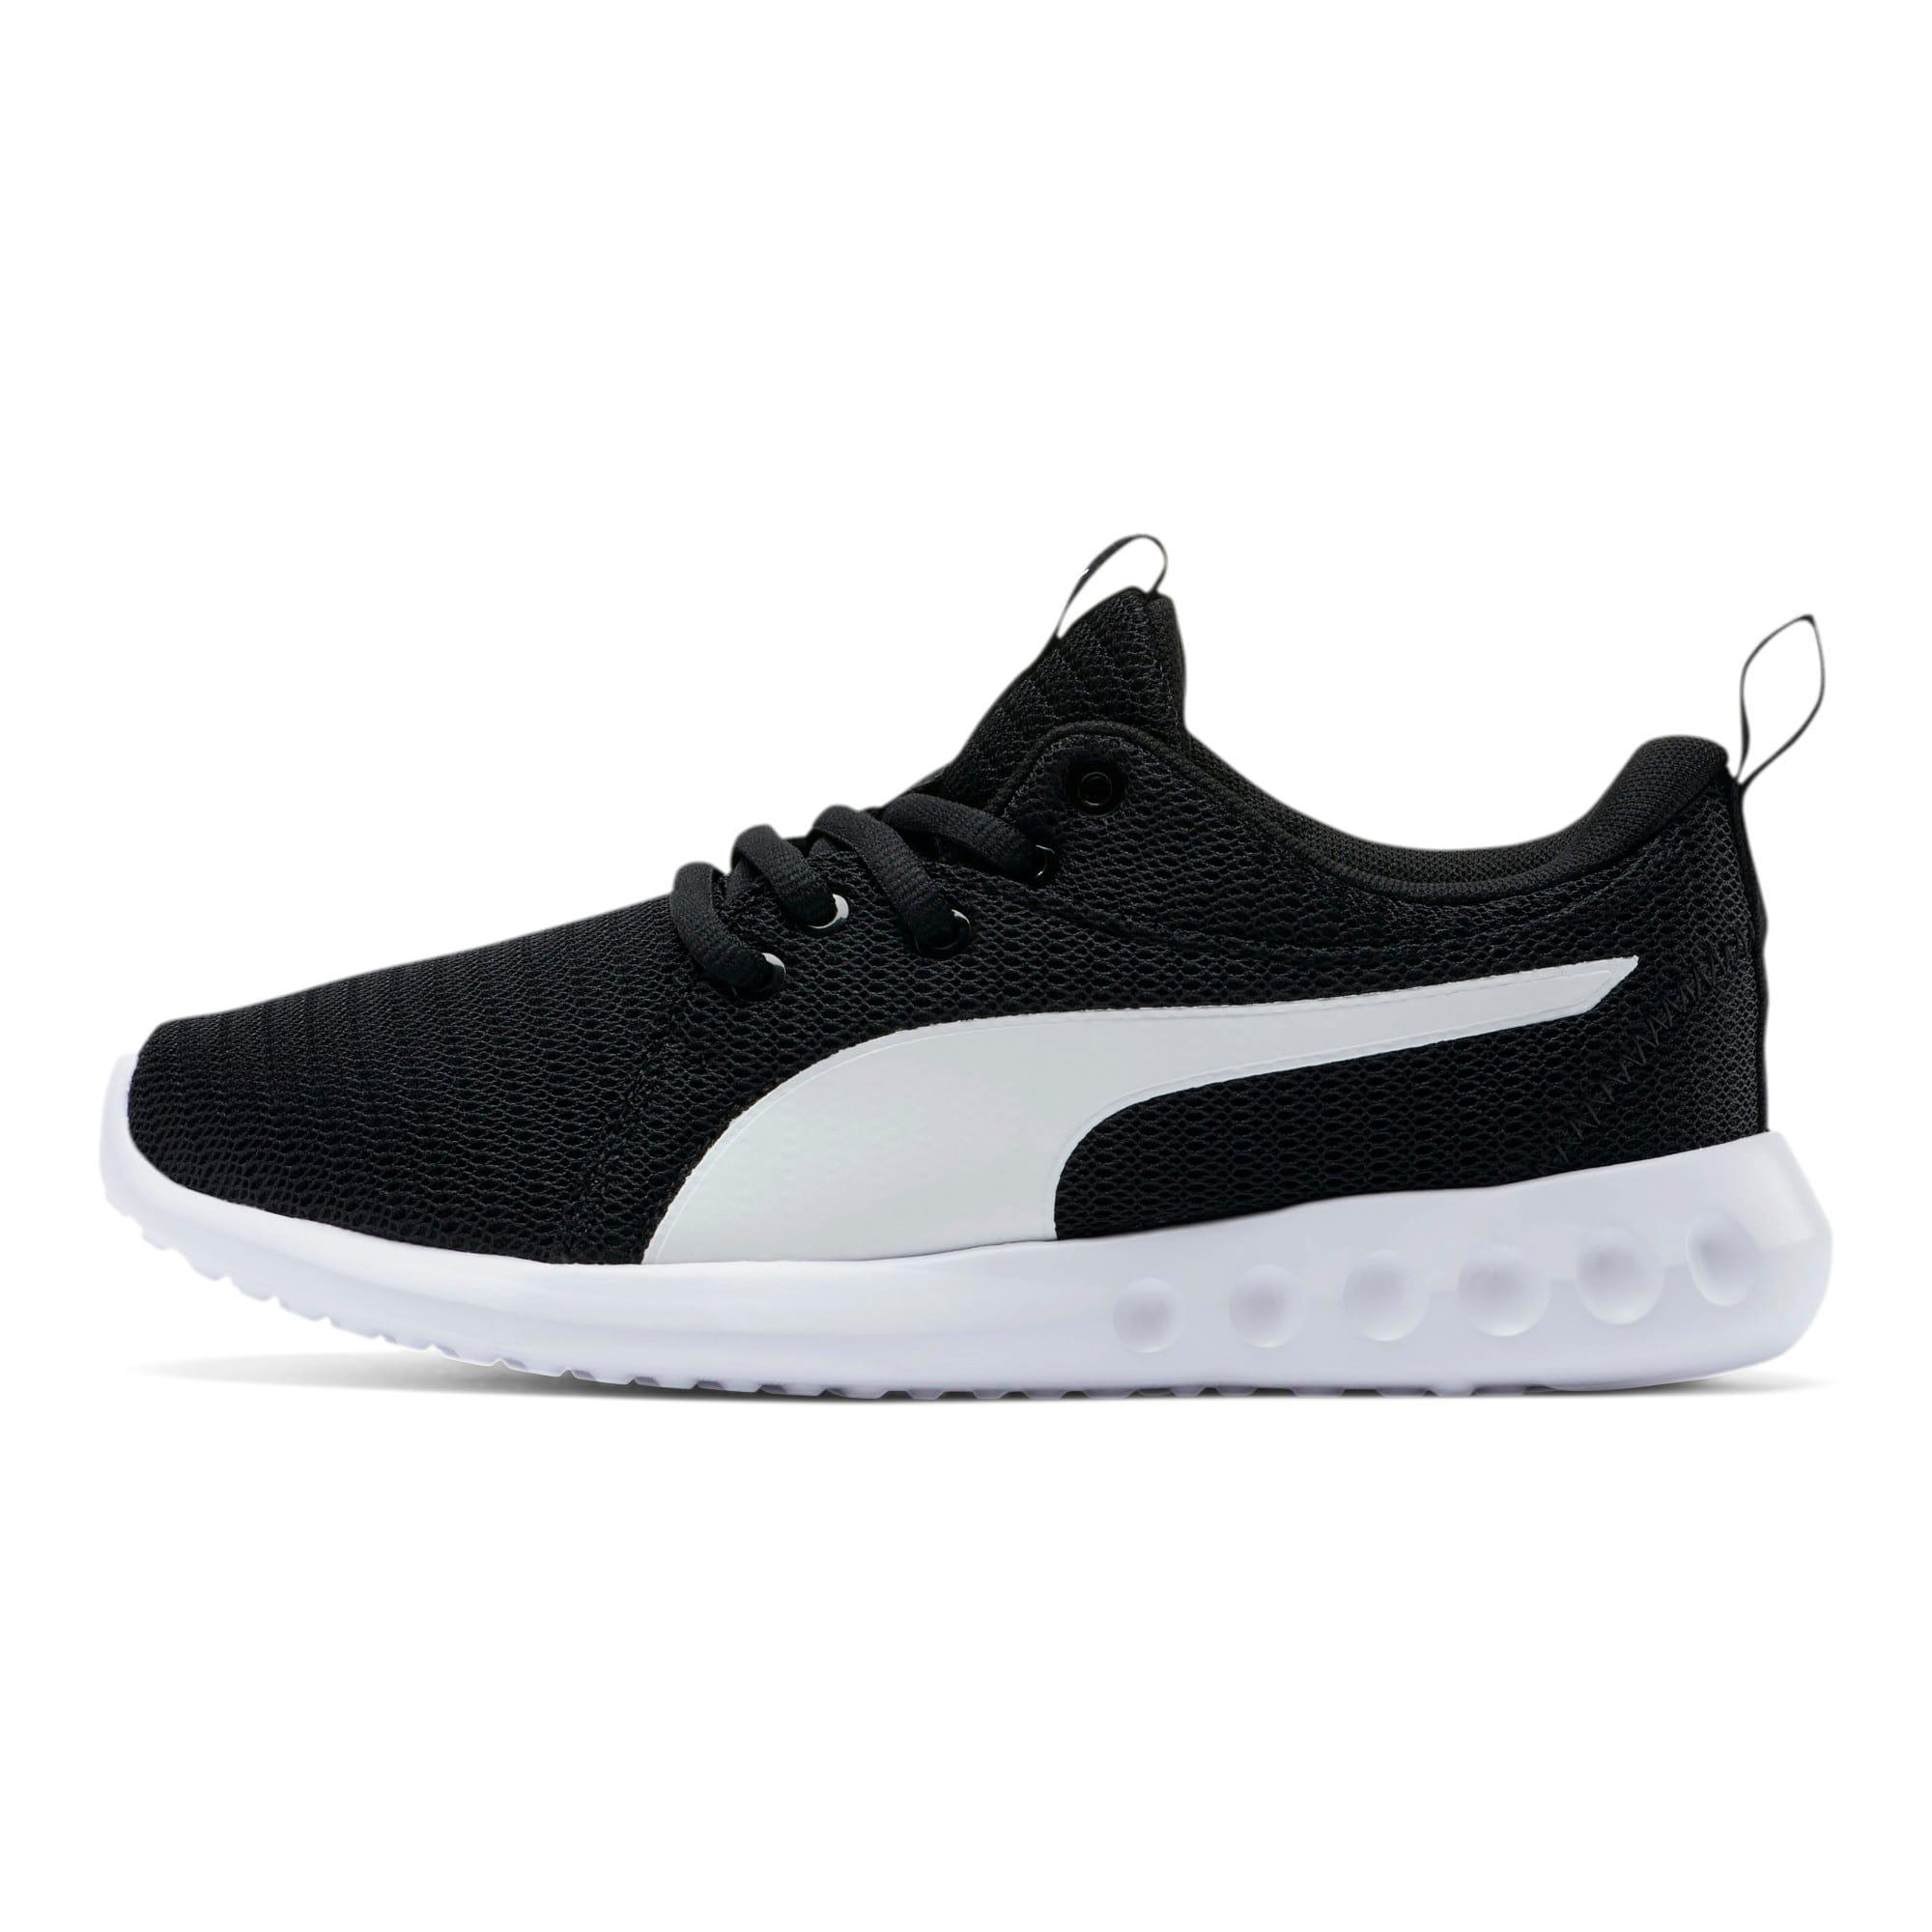 Thumbnail 1 of Carson 2 Sneakers JR, Puma Black-Puma White, medium